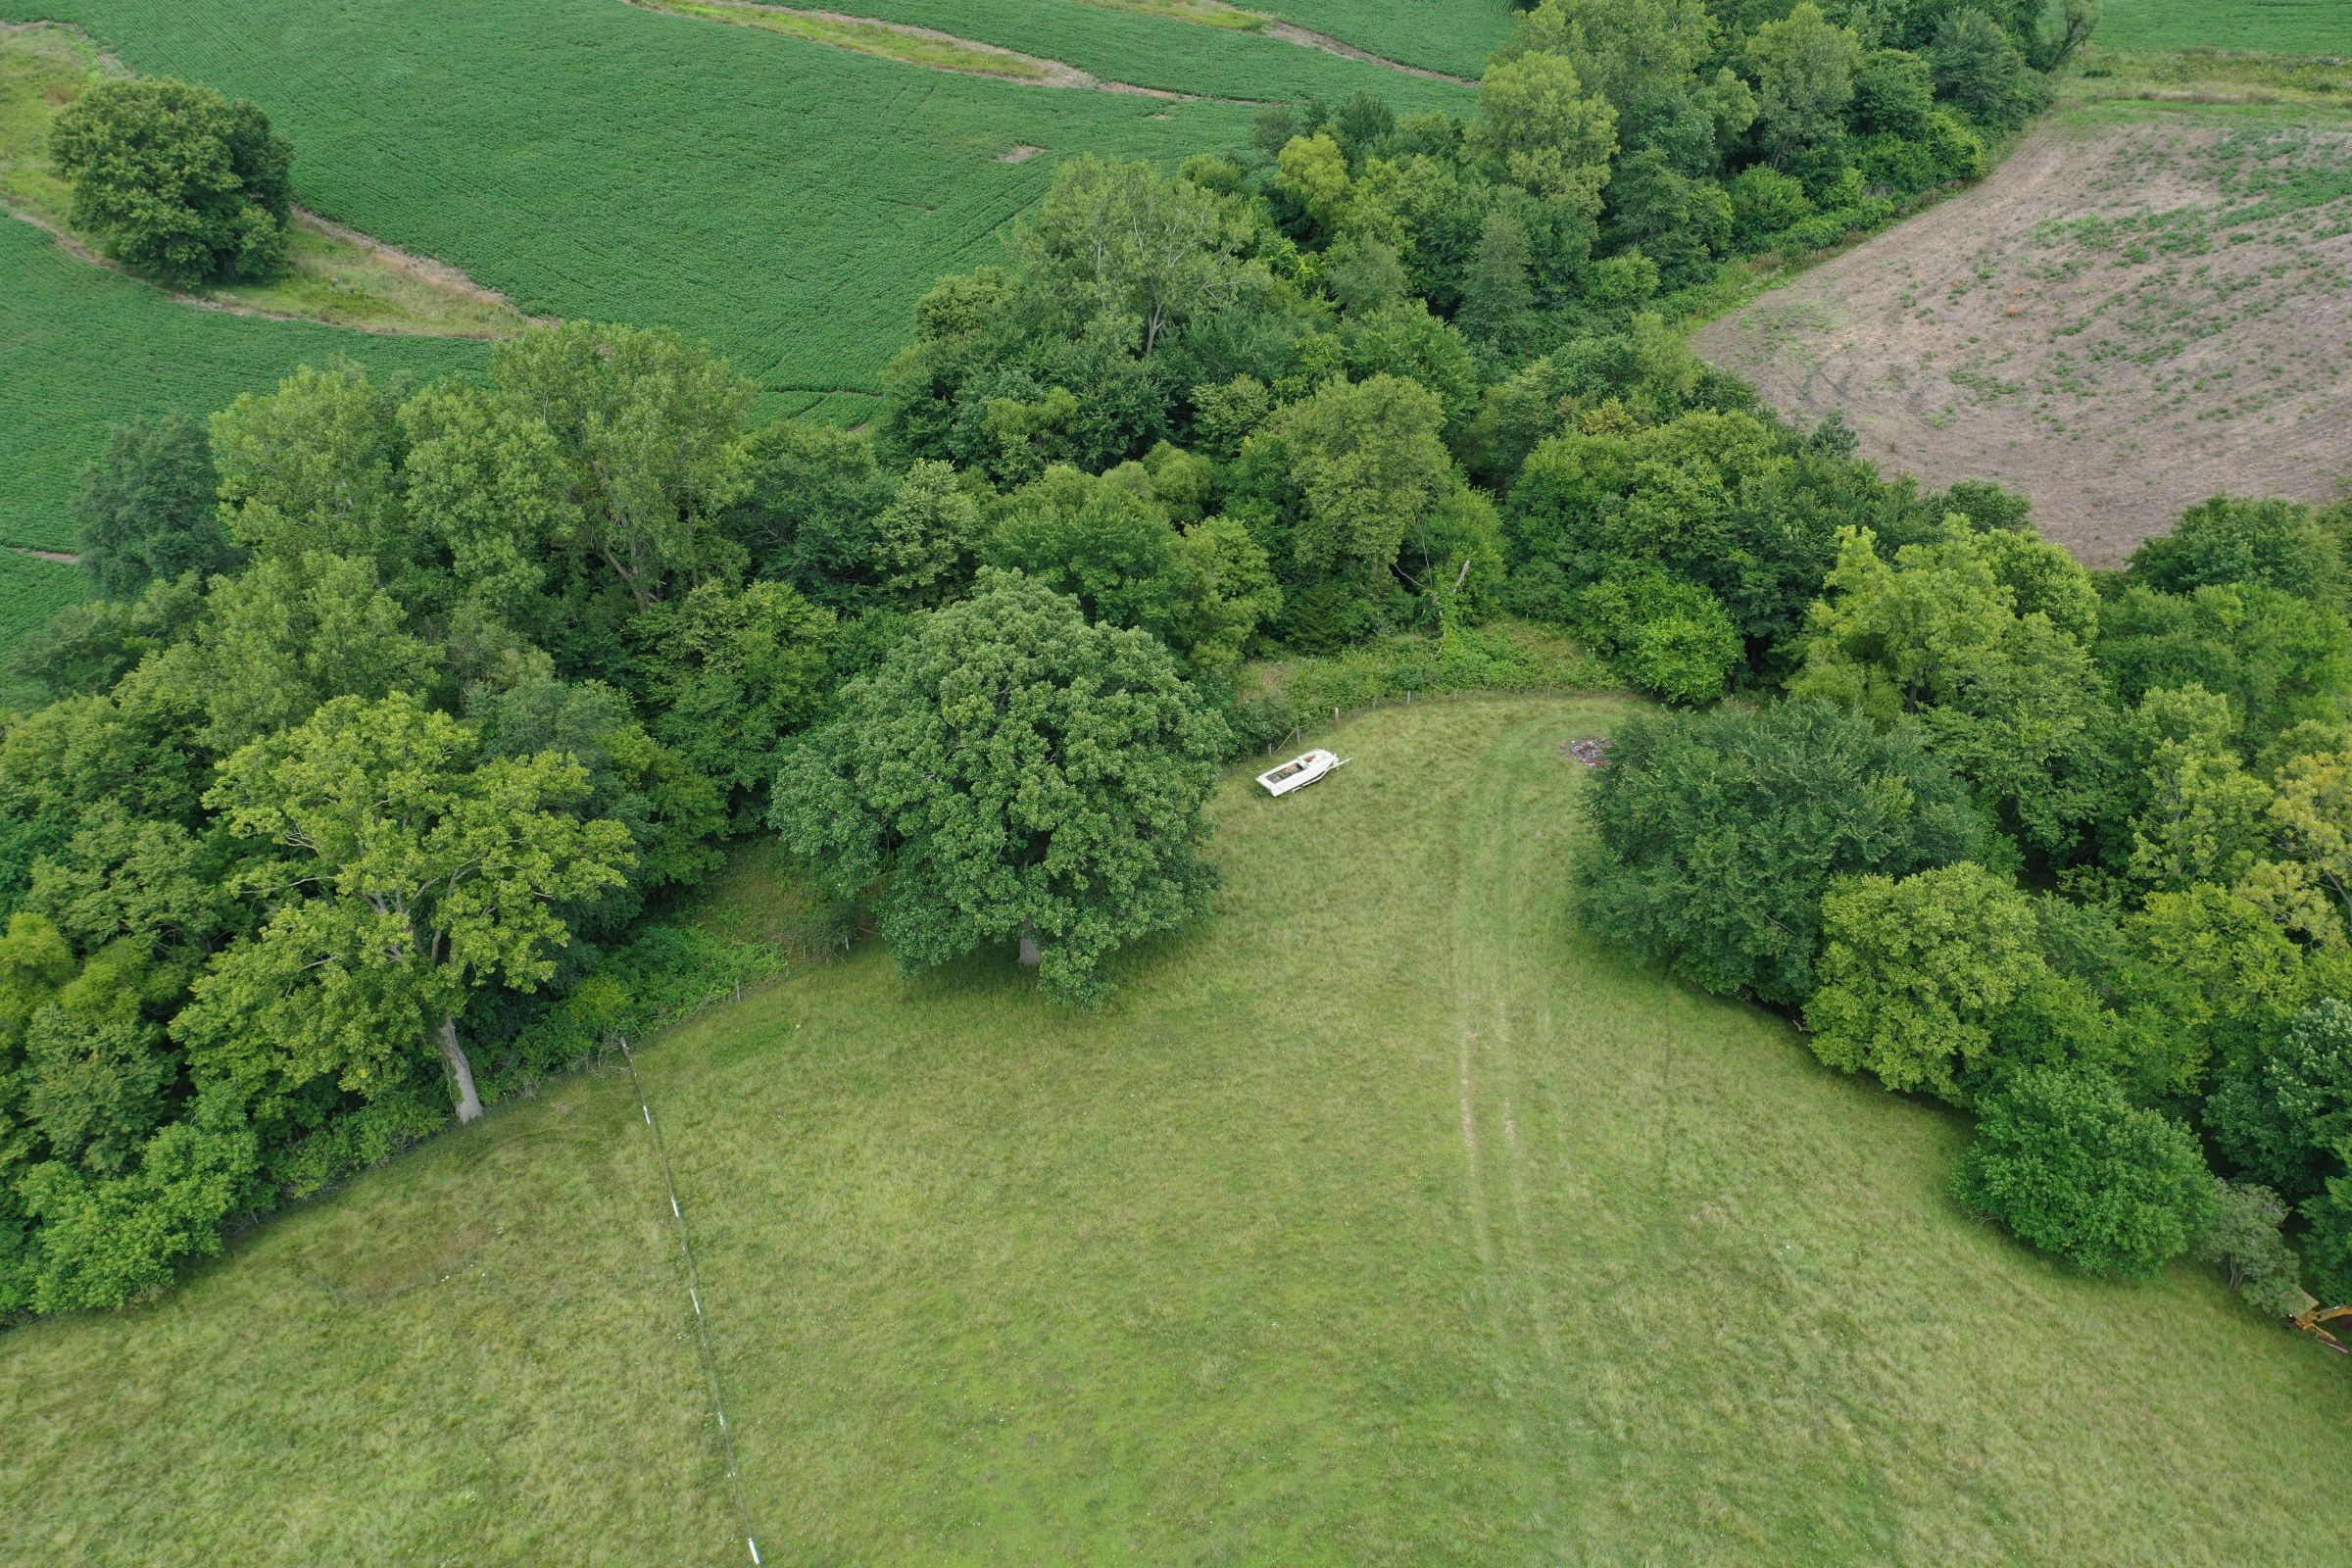 residential-warren-county-iowa-12-acres-listing-number-15104-6-2020-08-08-185056.jpg